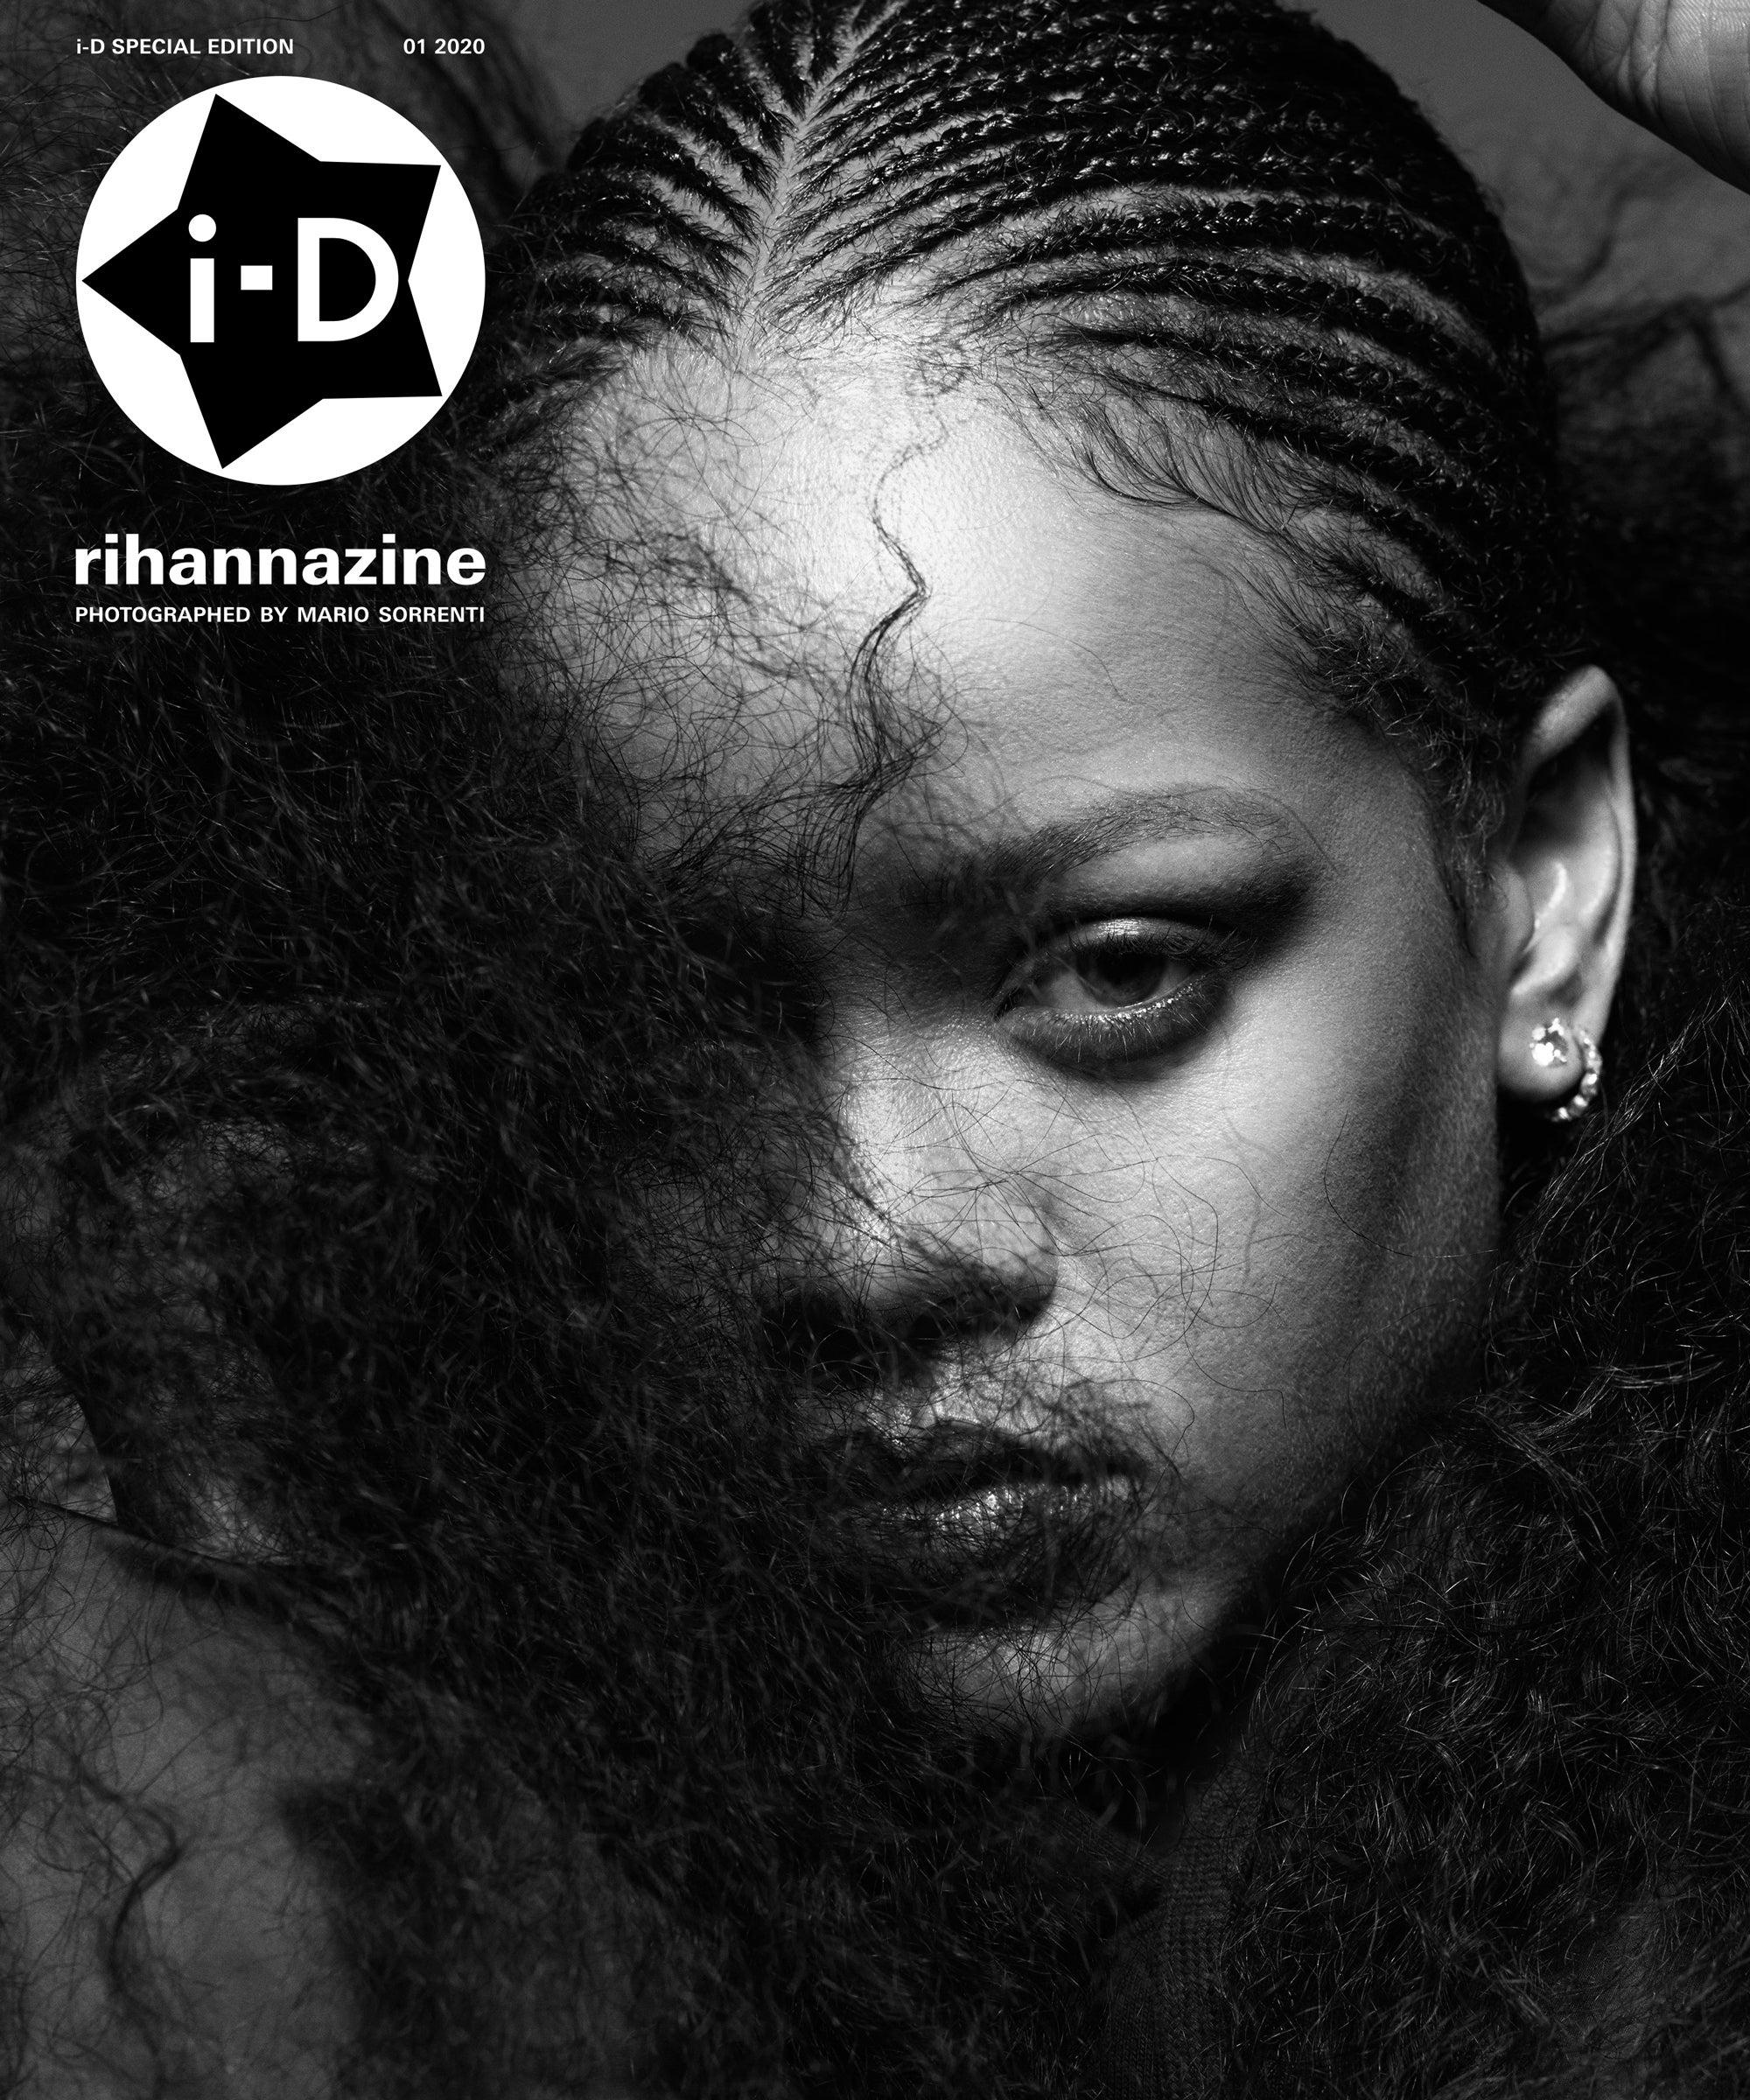 Rihanna's New Zine Celebrates Women She Admires In Fashion, Art & Activism